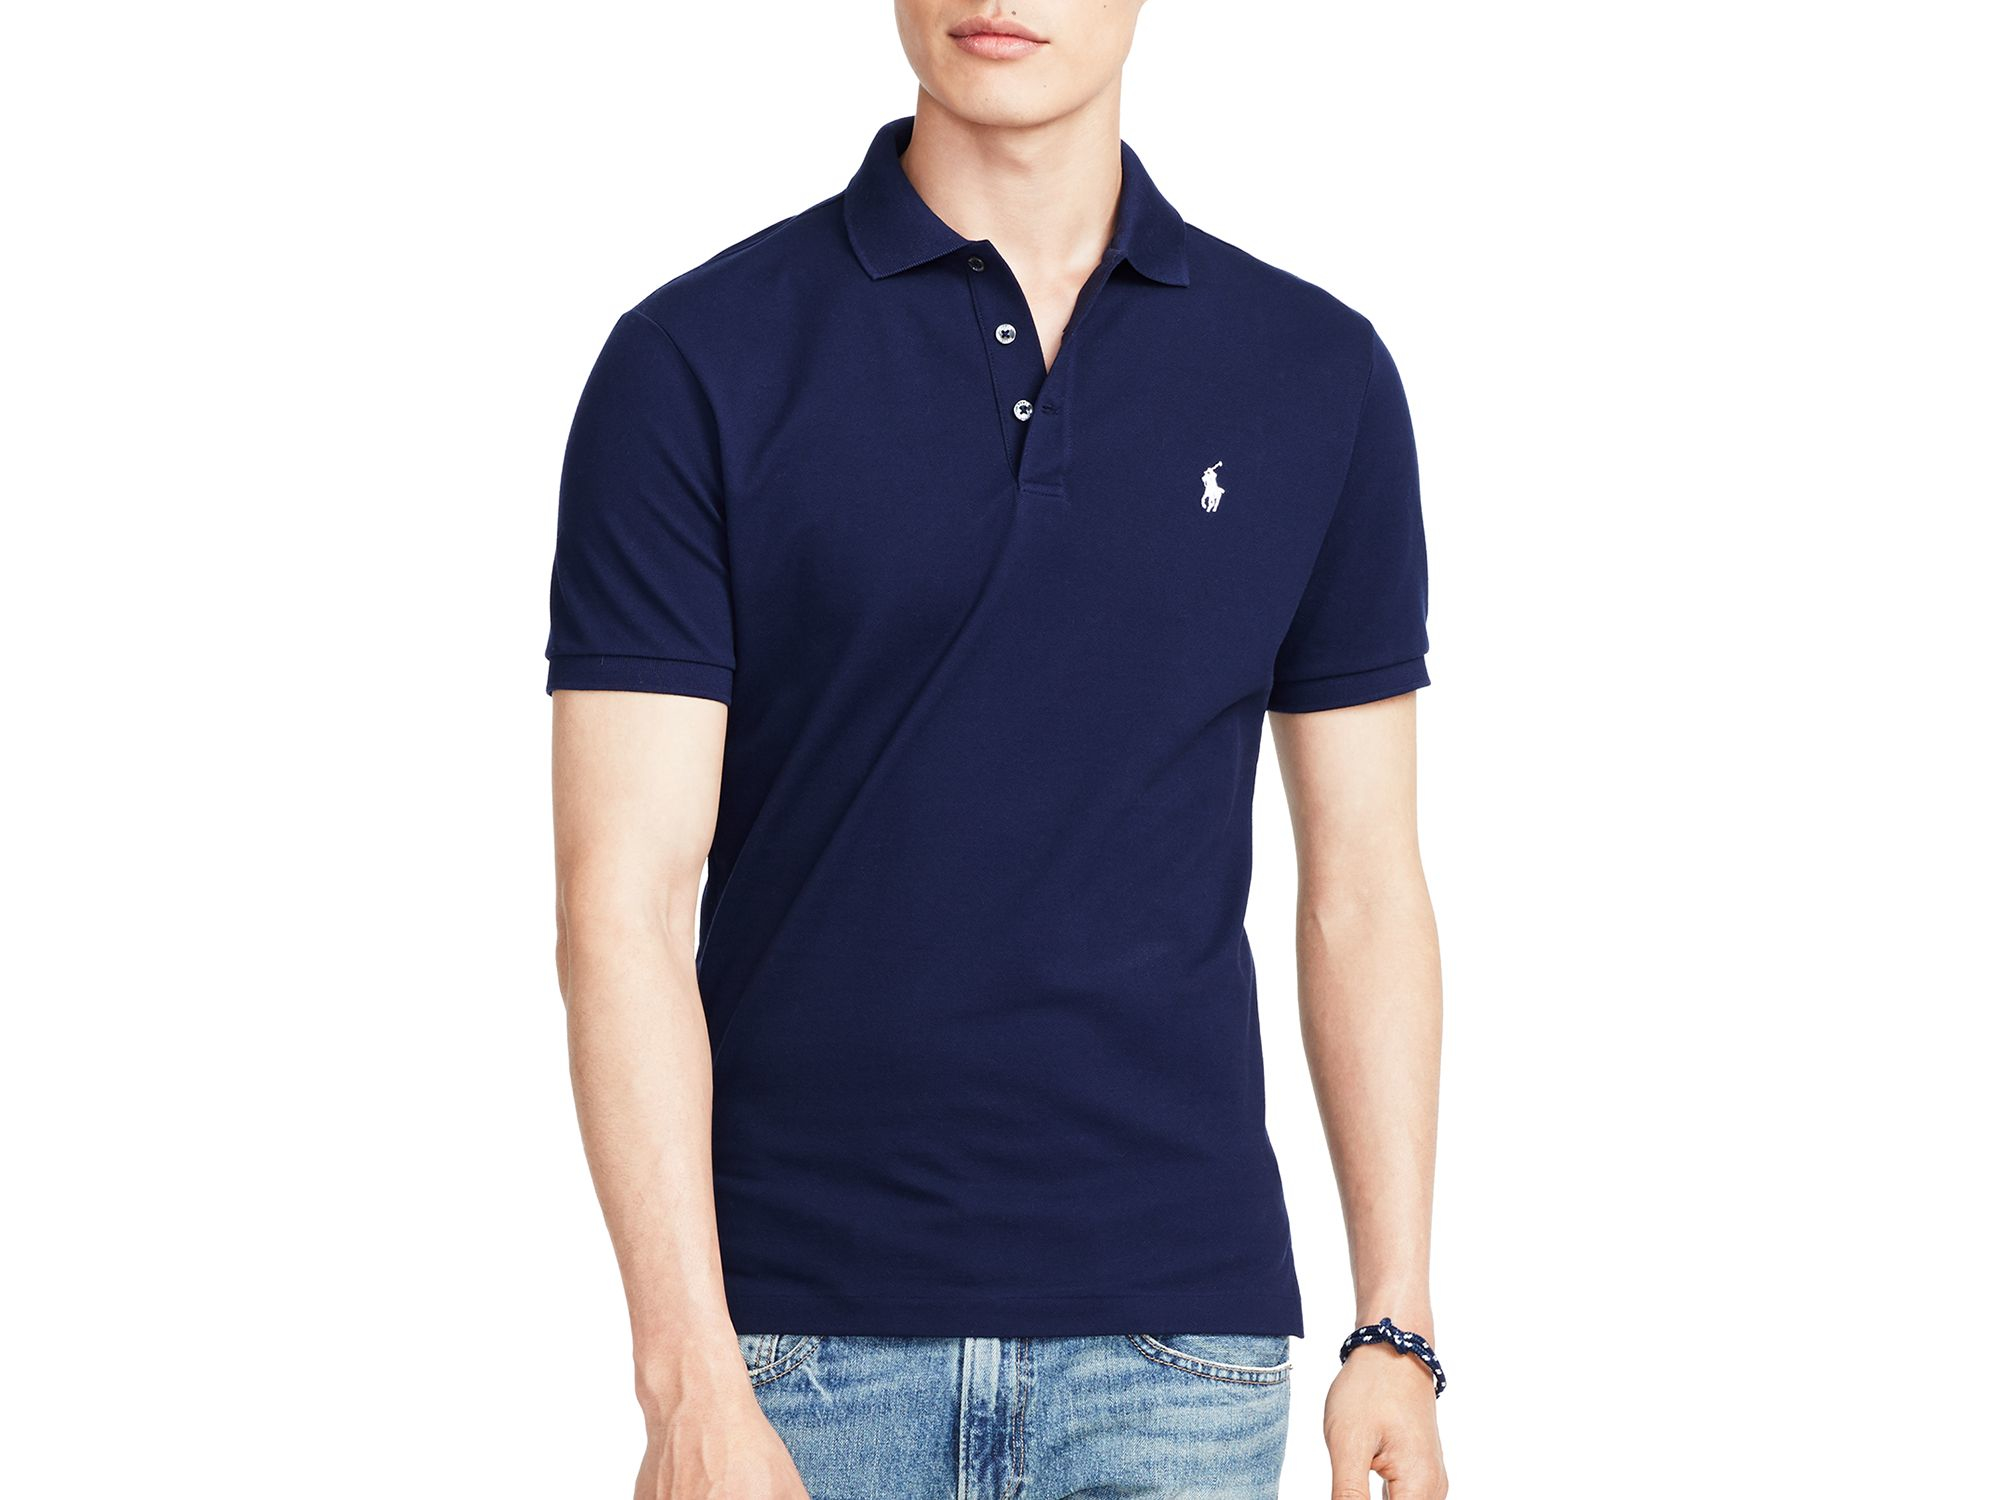 Polo Ralph Lauren Slim Fit Poloshirt French Navy d5b6f1e1e